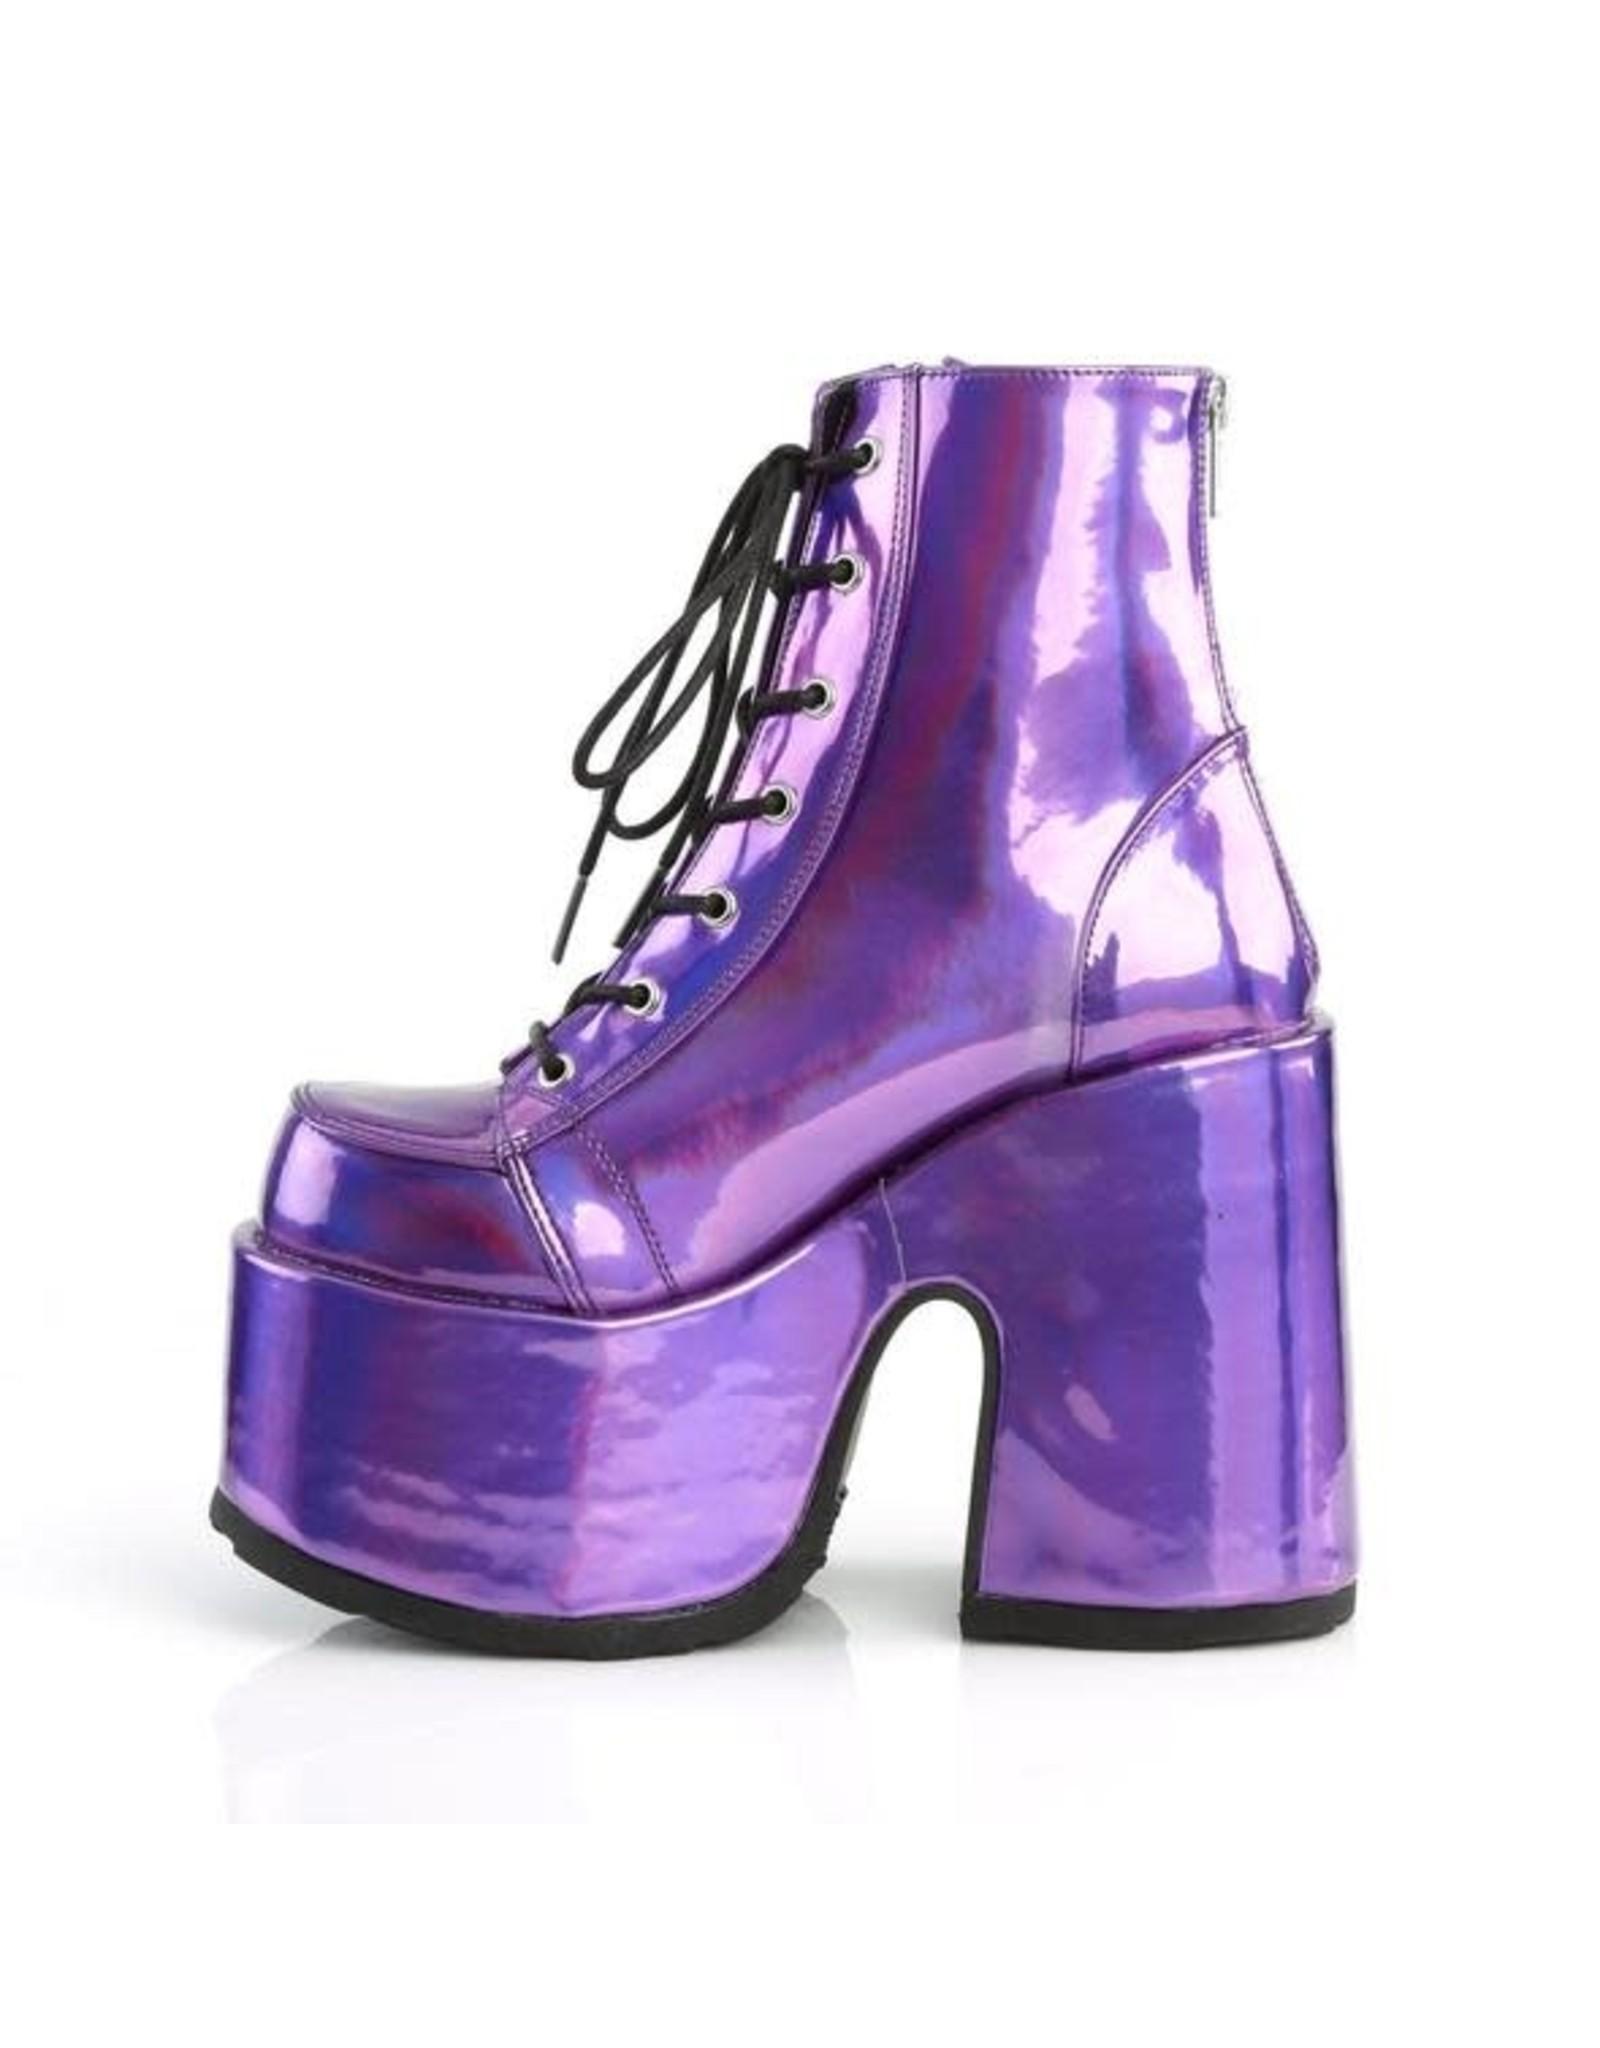 "DEMONIA CAMEL-203 5"" Chunky Heel, 3"" Platform Vegan Purple Hologram Lace-Up Ankle Boot, Back Zip Closure D23VPH"